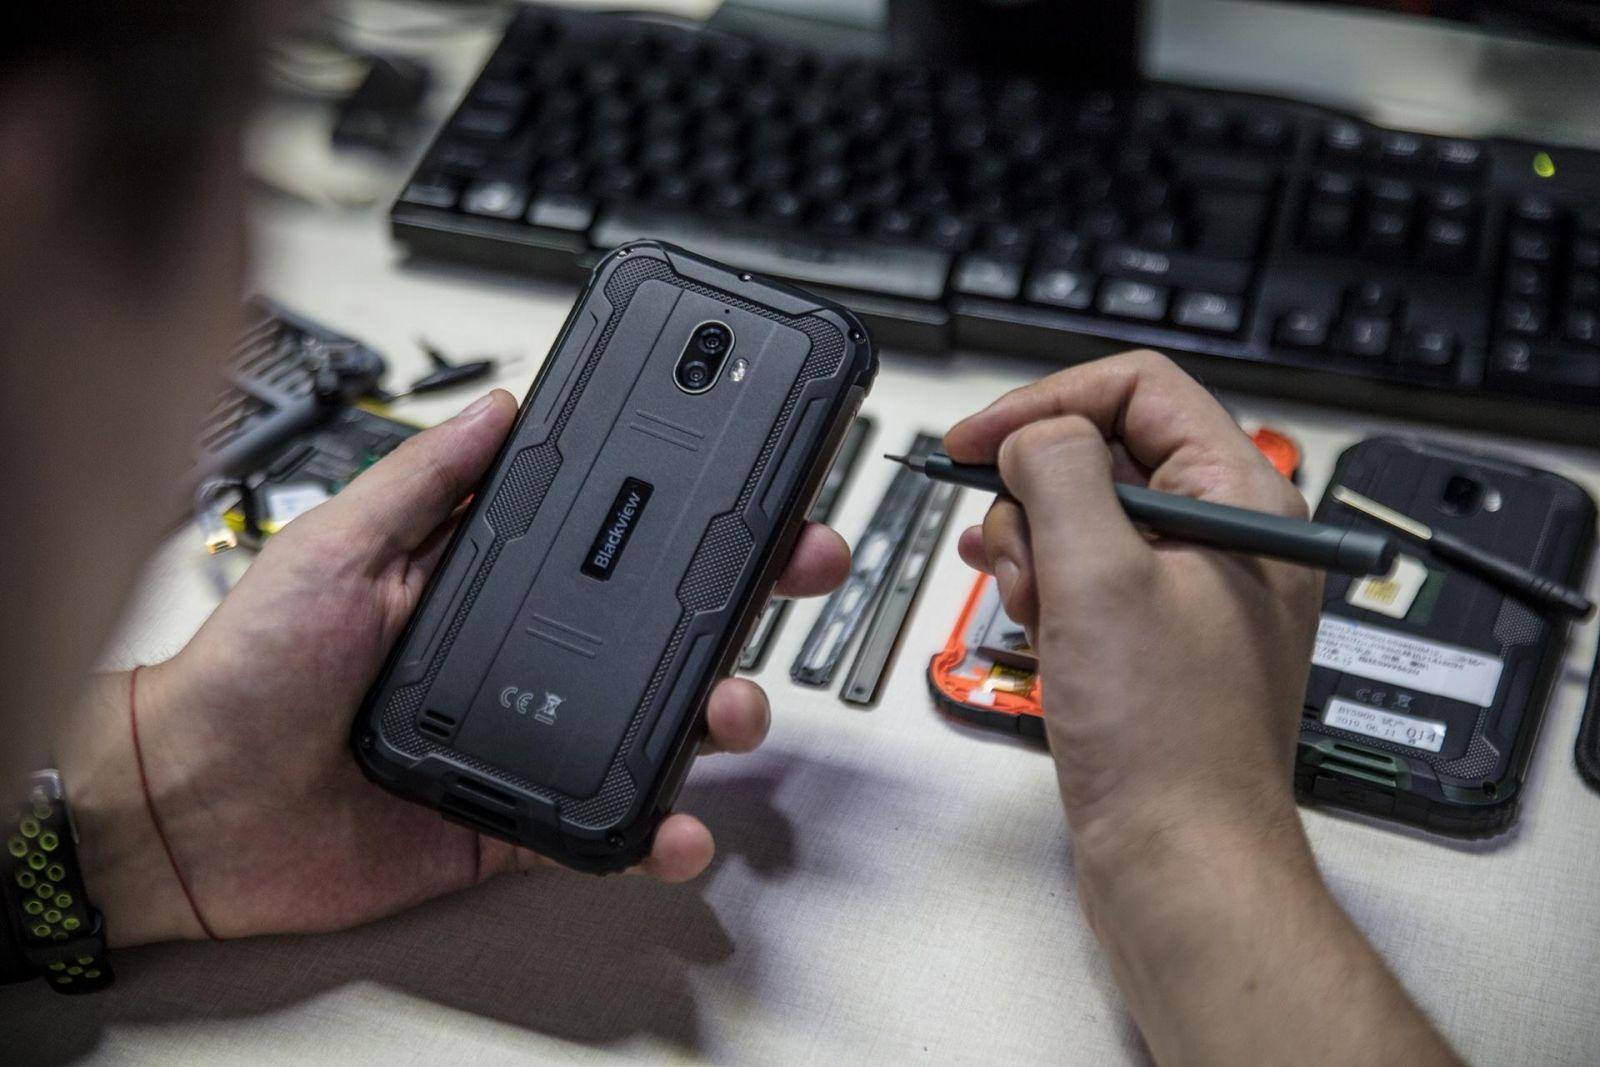 Blackview представила новый сверхпрочный смартфон (kosmicheskij blackview bv5900 s maksimalnoj zaschitoj na foto i video picture4 2)